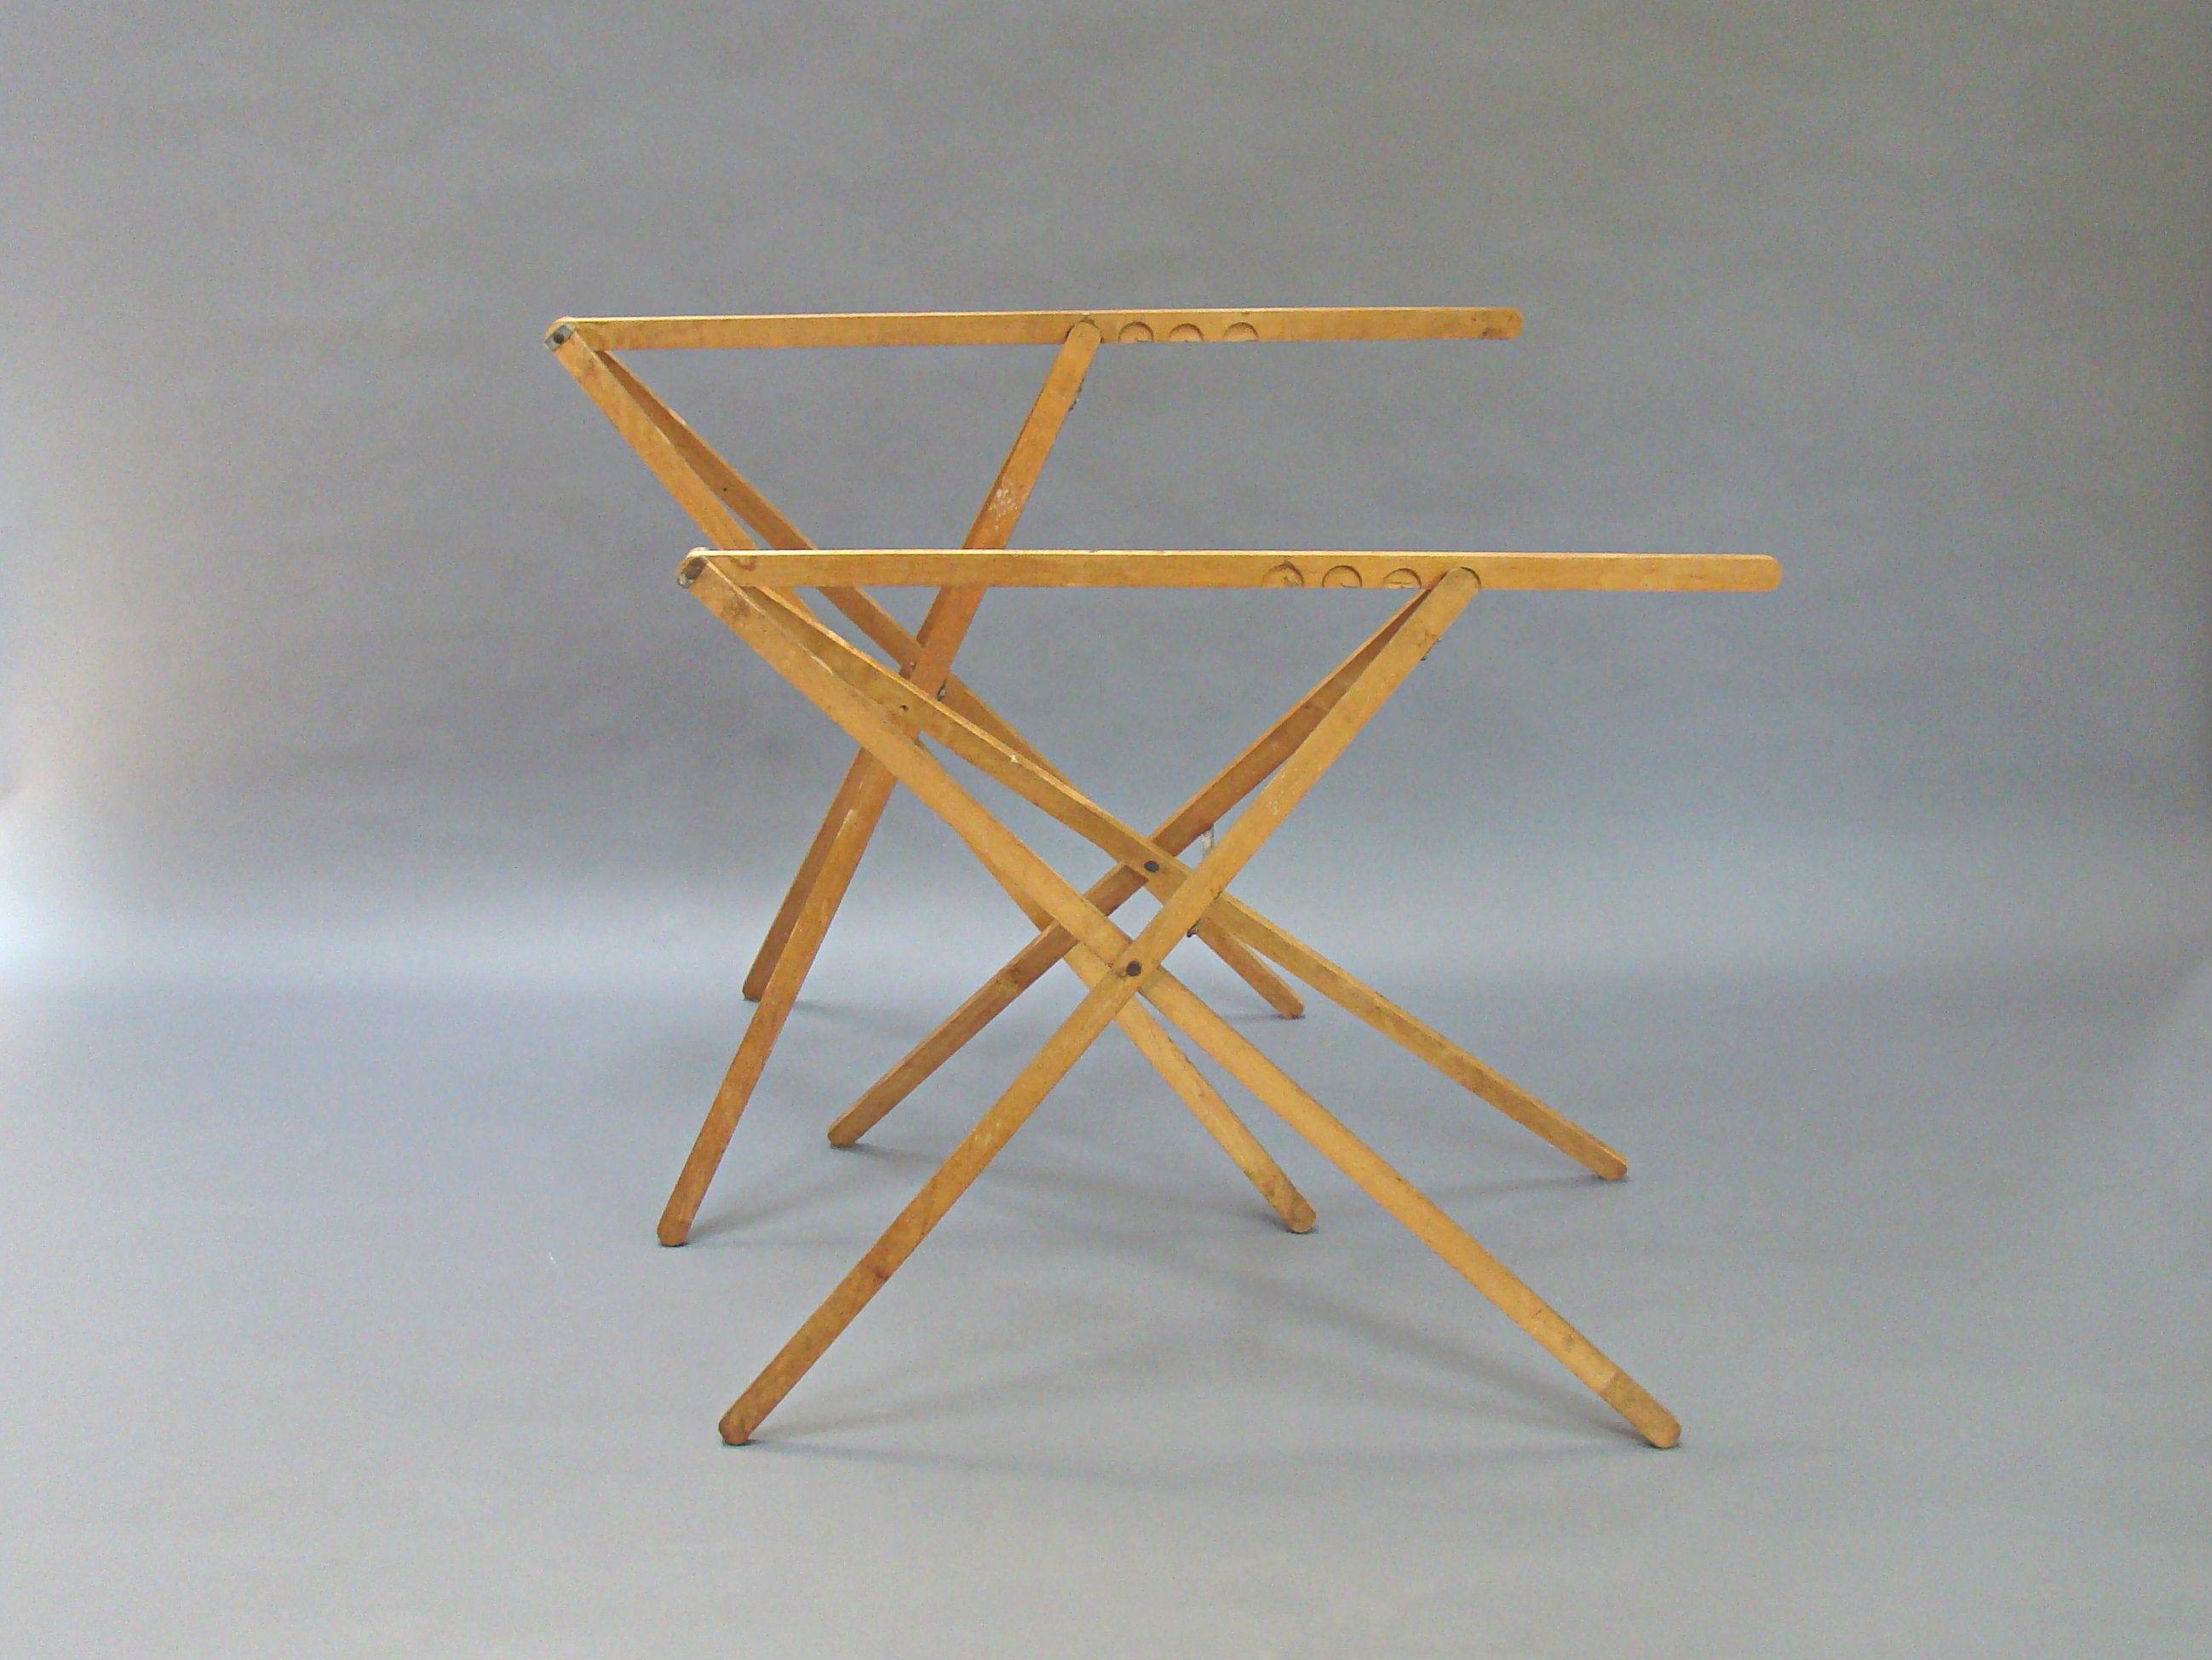 Pair Of Wallpaper Table Legs Trestle Legs Folding Table Etsy In 2020 Folding Table Legs Table Legs Portable Table